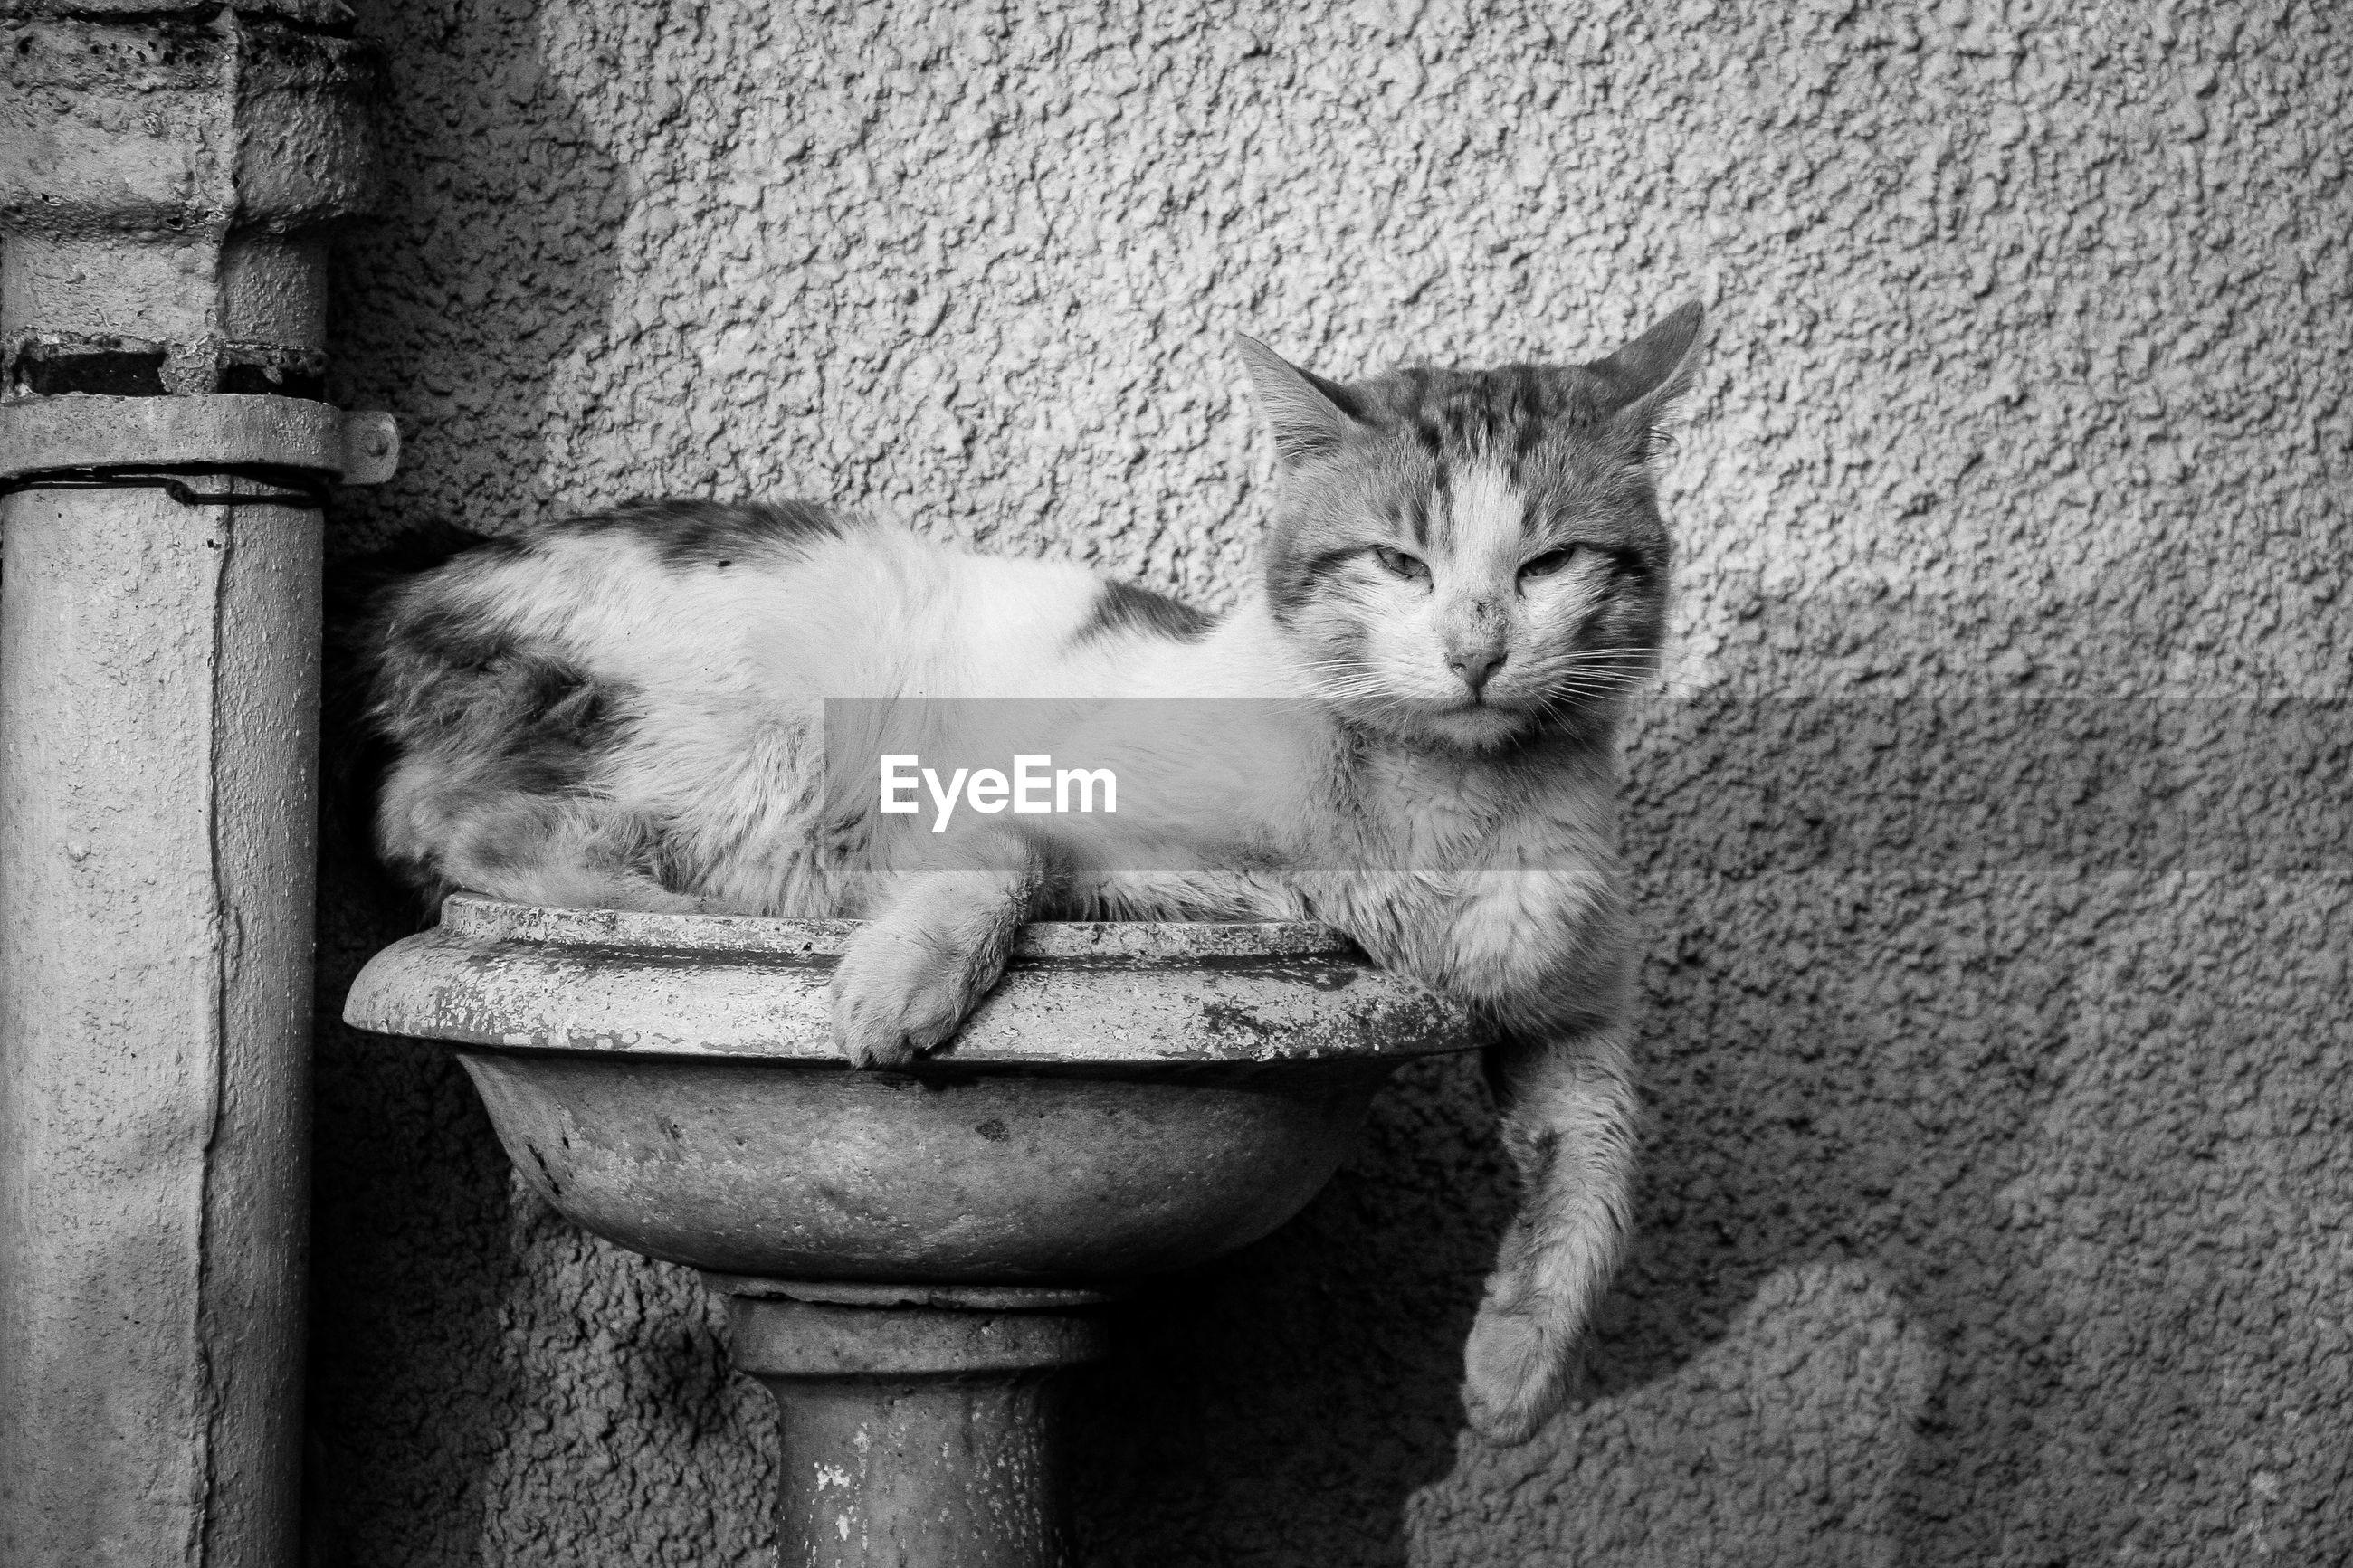 Portrait of cat sitting in bird bath against textured wall